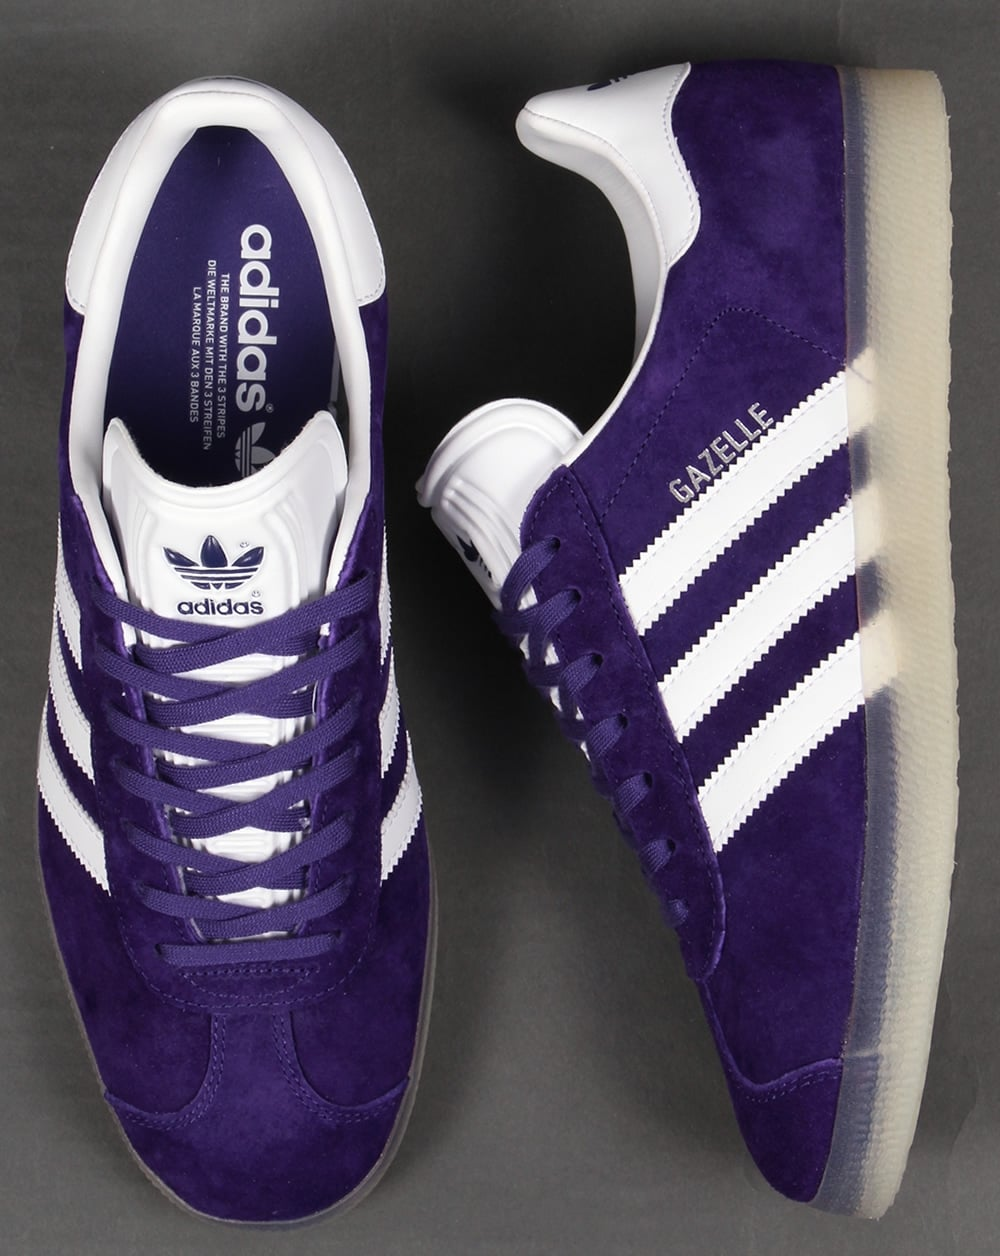 profundo linda Avanzado  aproksimacija kompas utjecaj adidas purple gum sole - goldstandardsounds.com